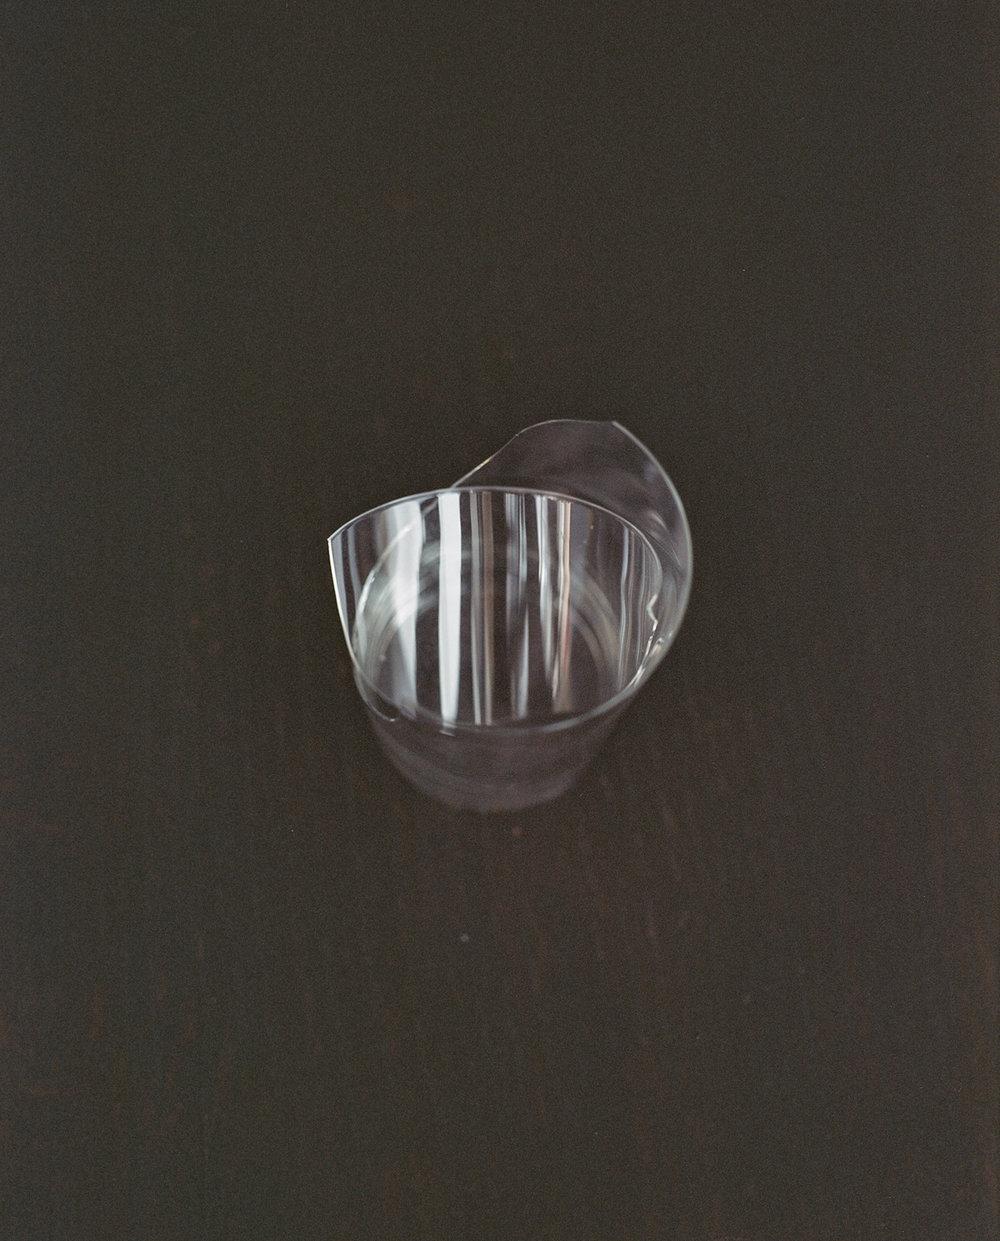 Broken Glass #17